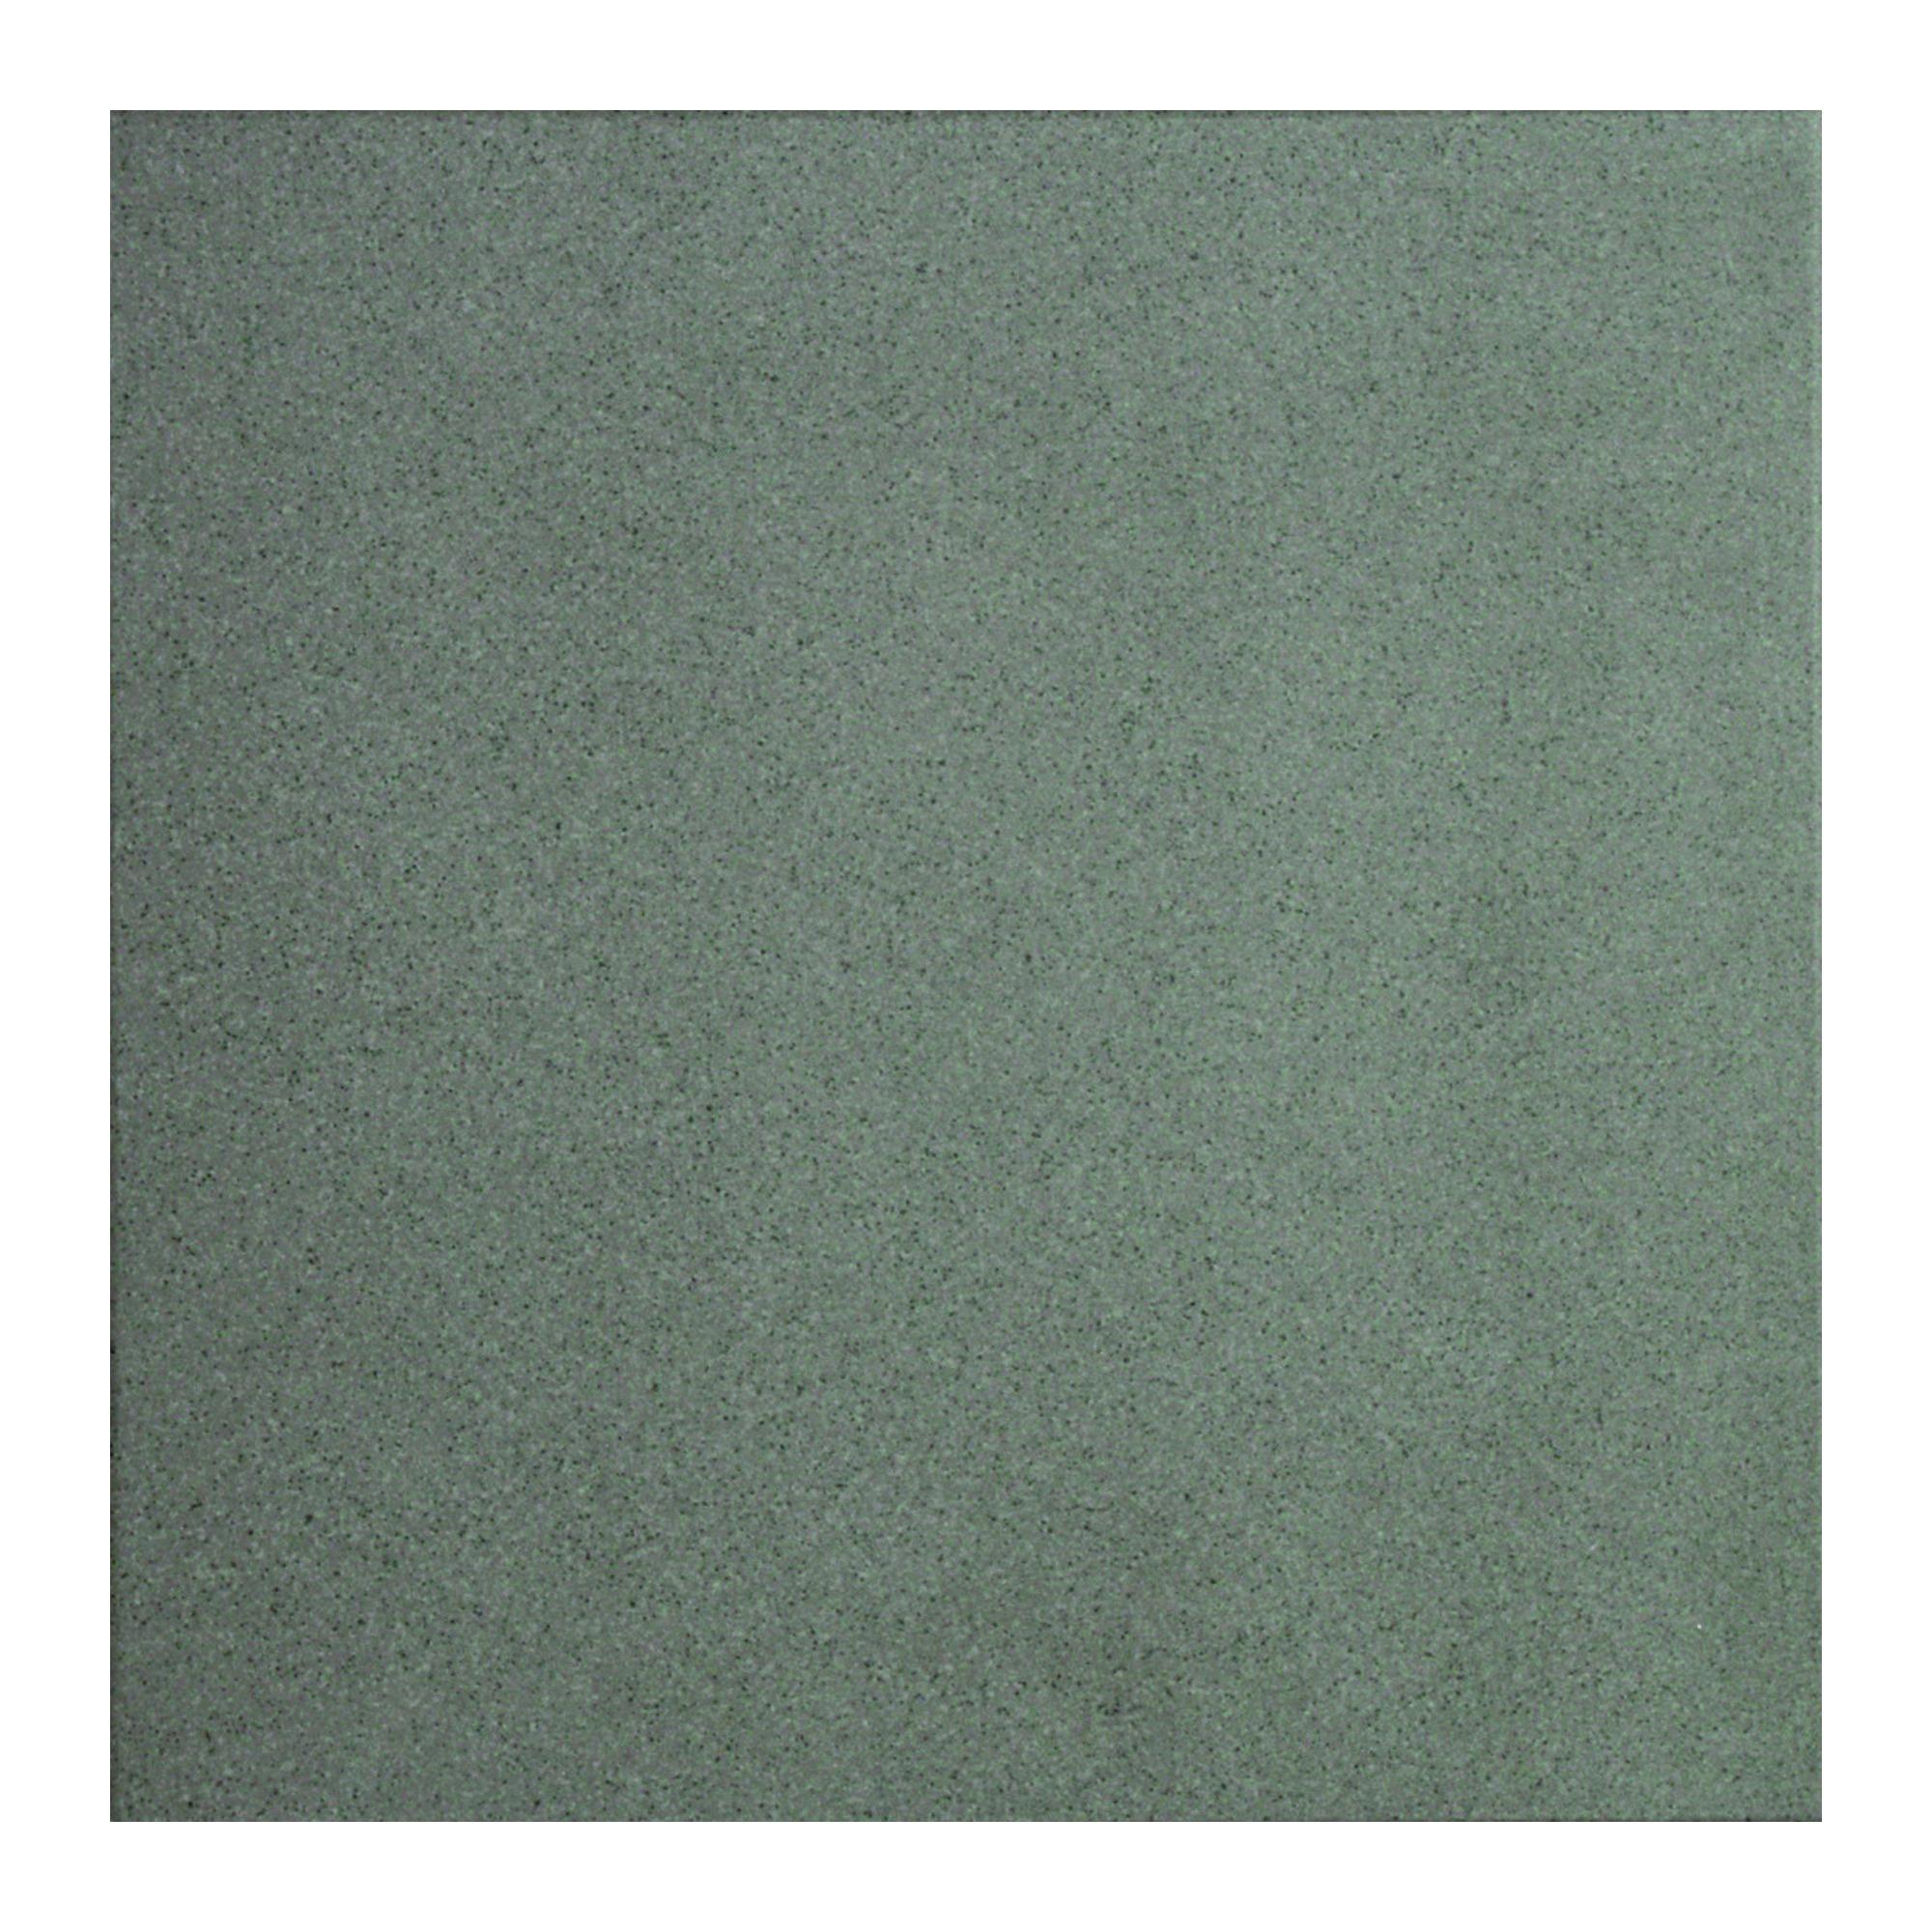 dalle de sol keram line gris 30x30cm 1 44m carrelage. Black Bedroom Furniture Sets. Home Design Ideas